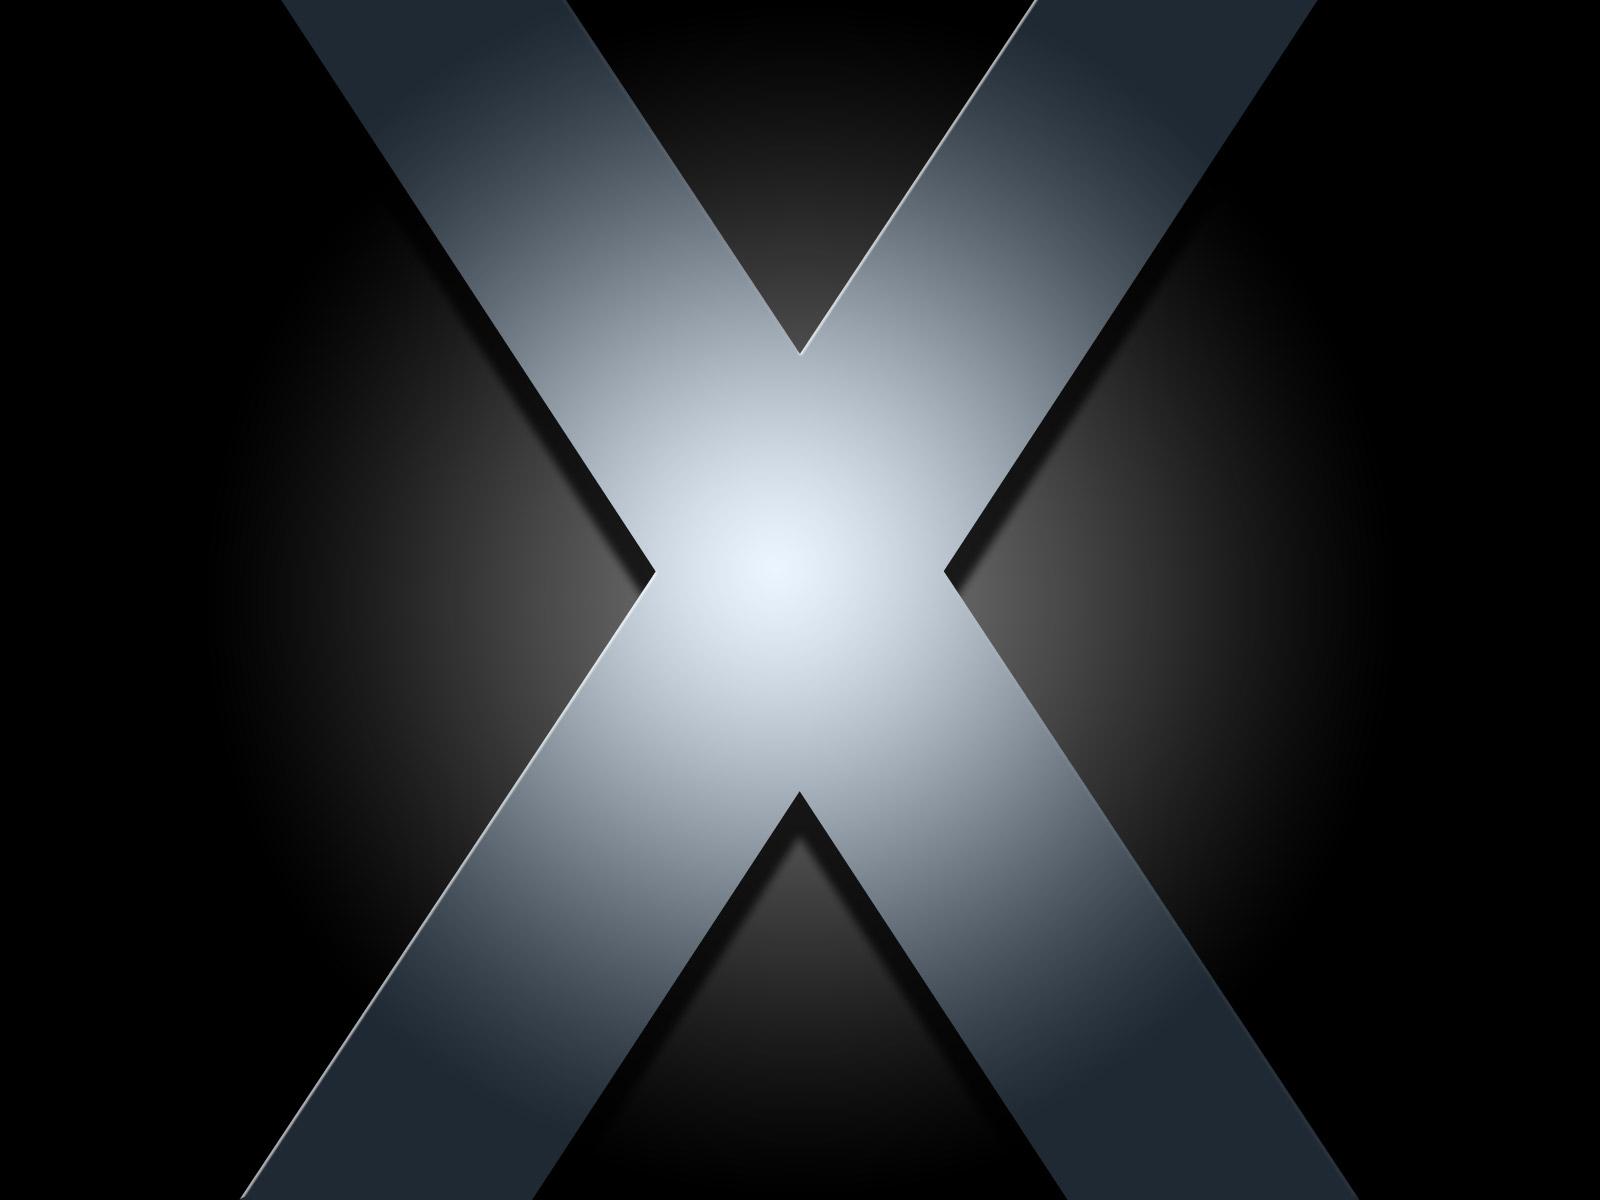 Hd Iphone X Wallpapers: OS X Wallpaper HD